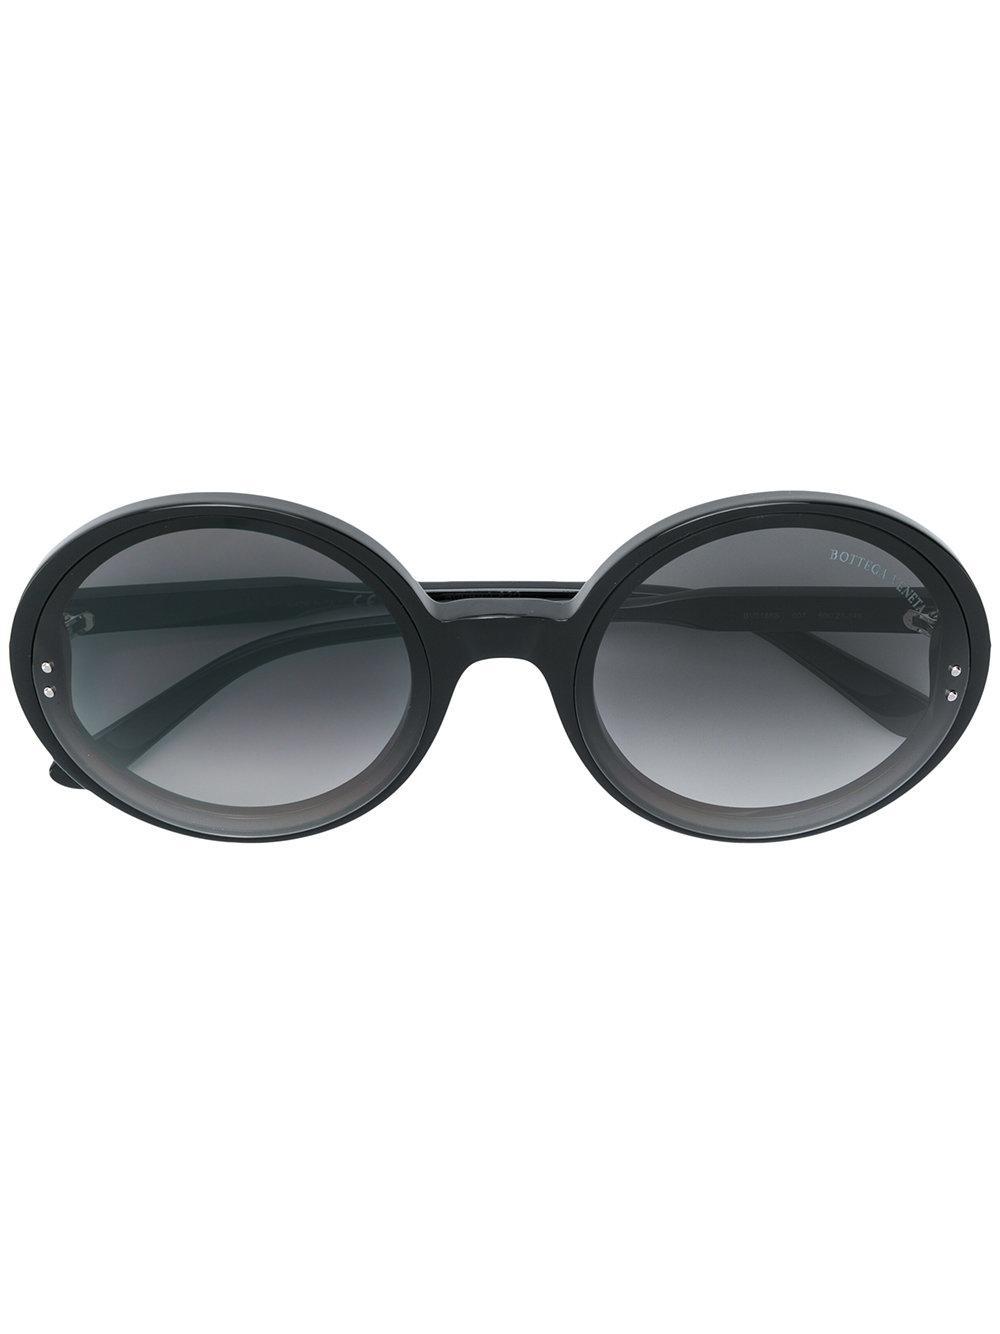 9b9d8970c65 BOTTEGA VENETA. Bottega Veneta Eyewear Oversized Round Shaped Sunglasses ...